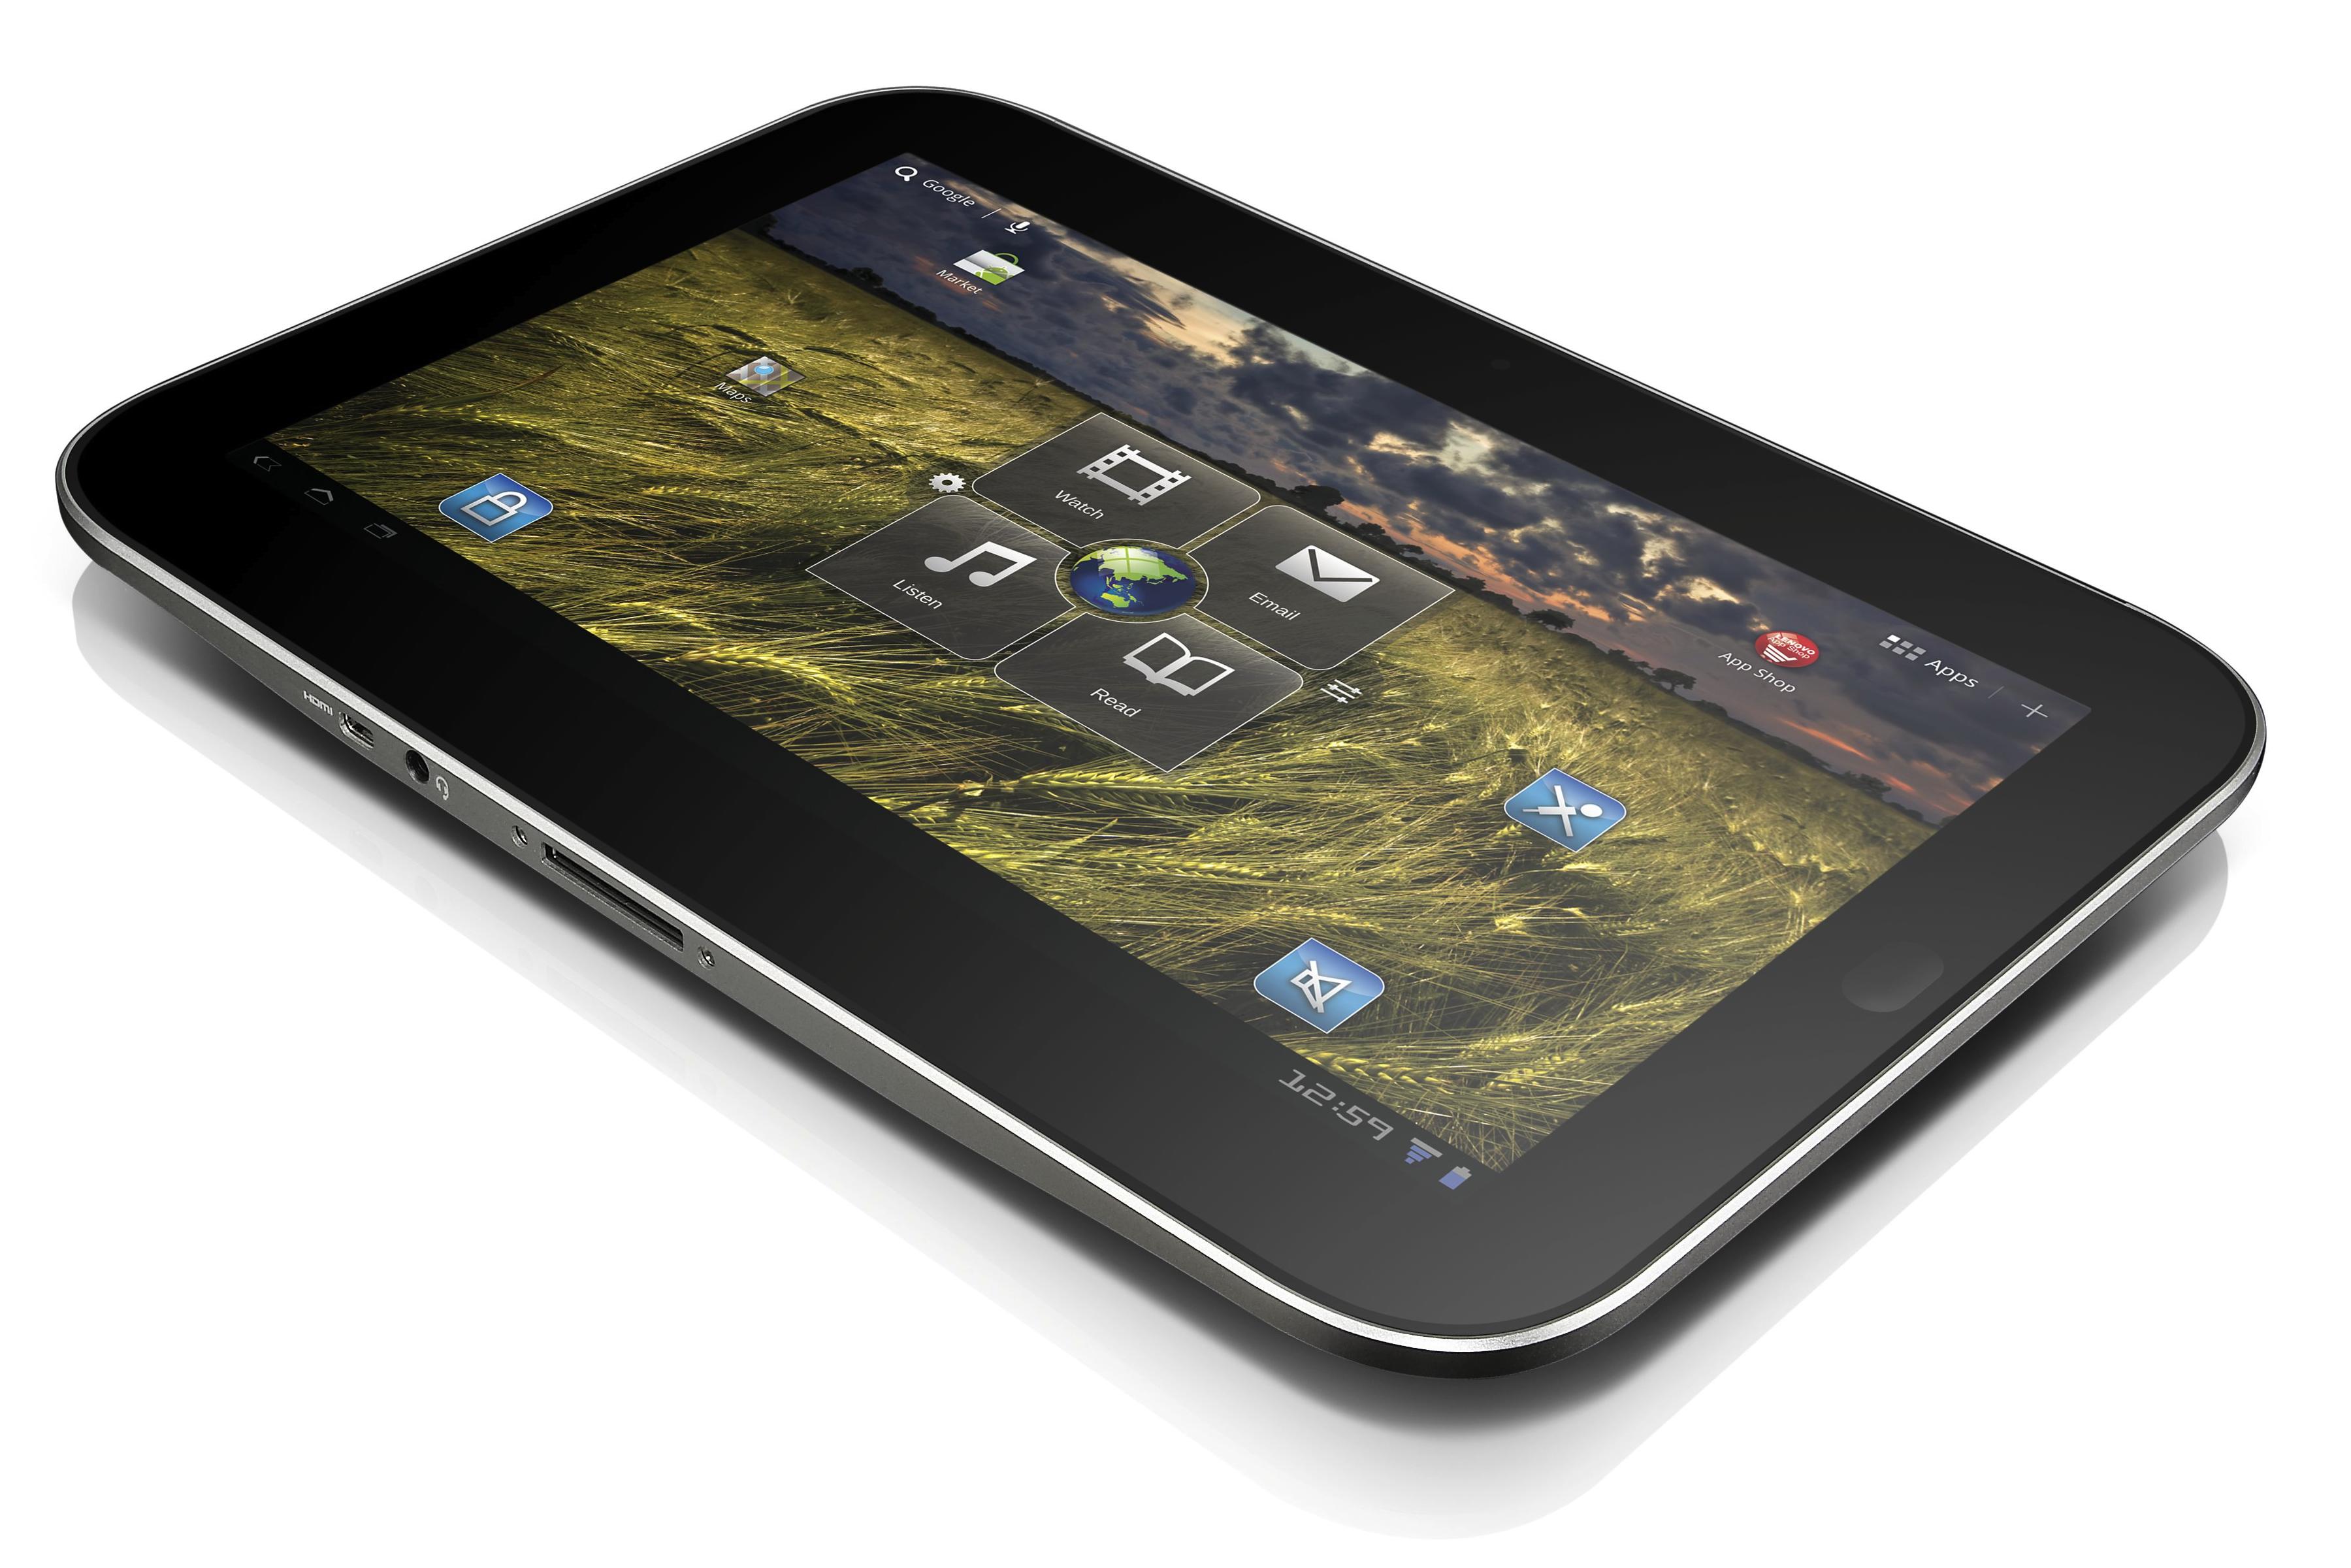 thinkpad-tablet-featured